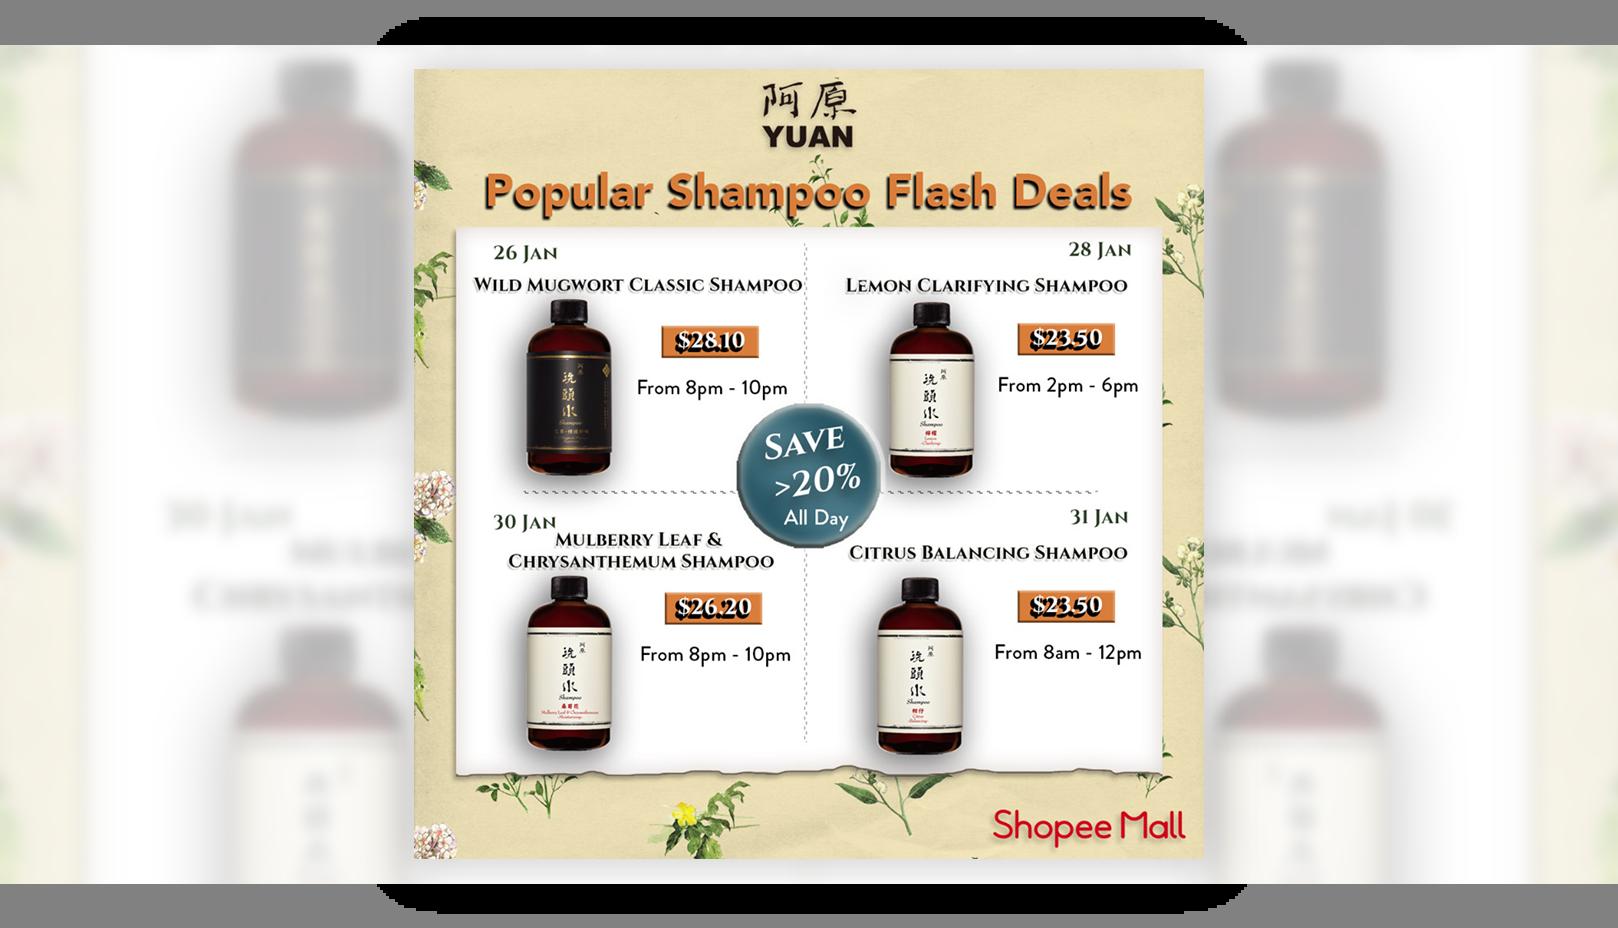 yuan skincare shampoo flash deals on shopee mall this 2021 january